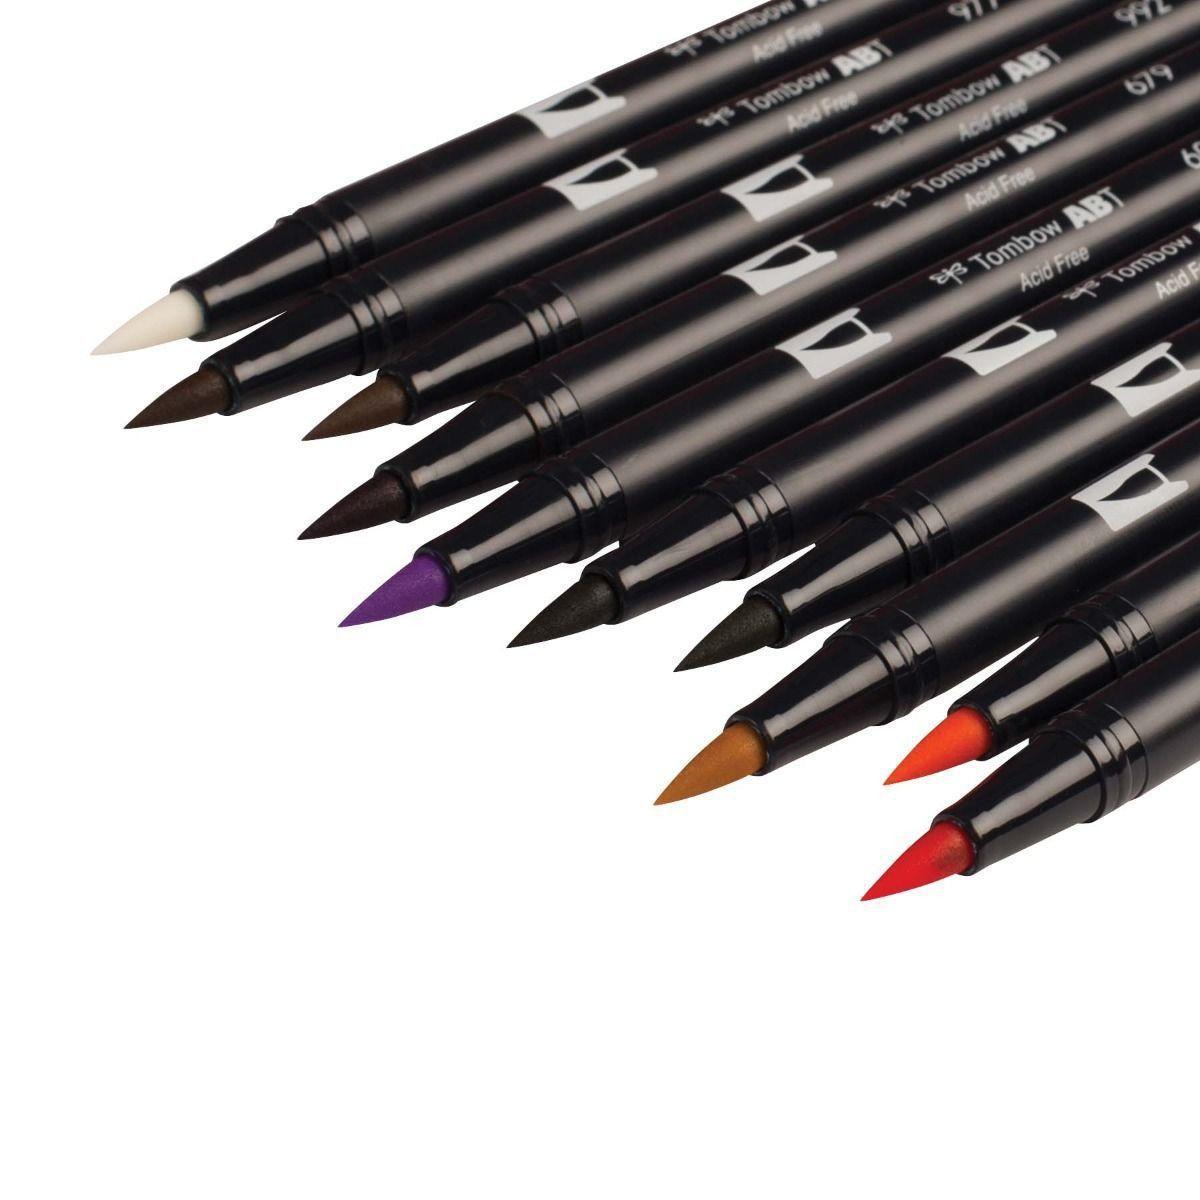 Canetas Dual Brush Tombow Kit c/10 canetas - Secundárias